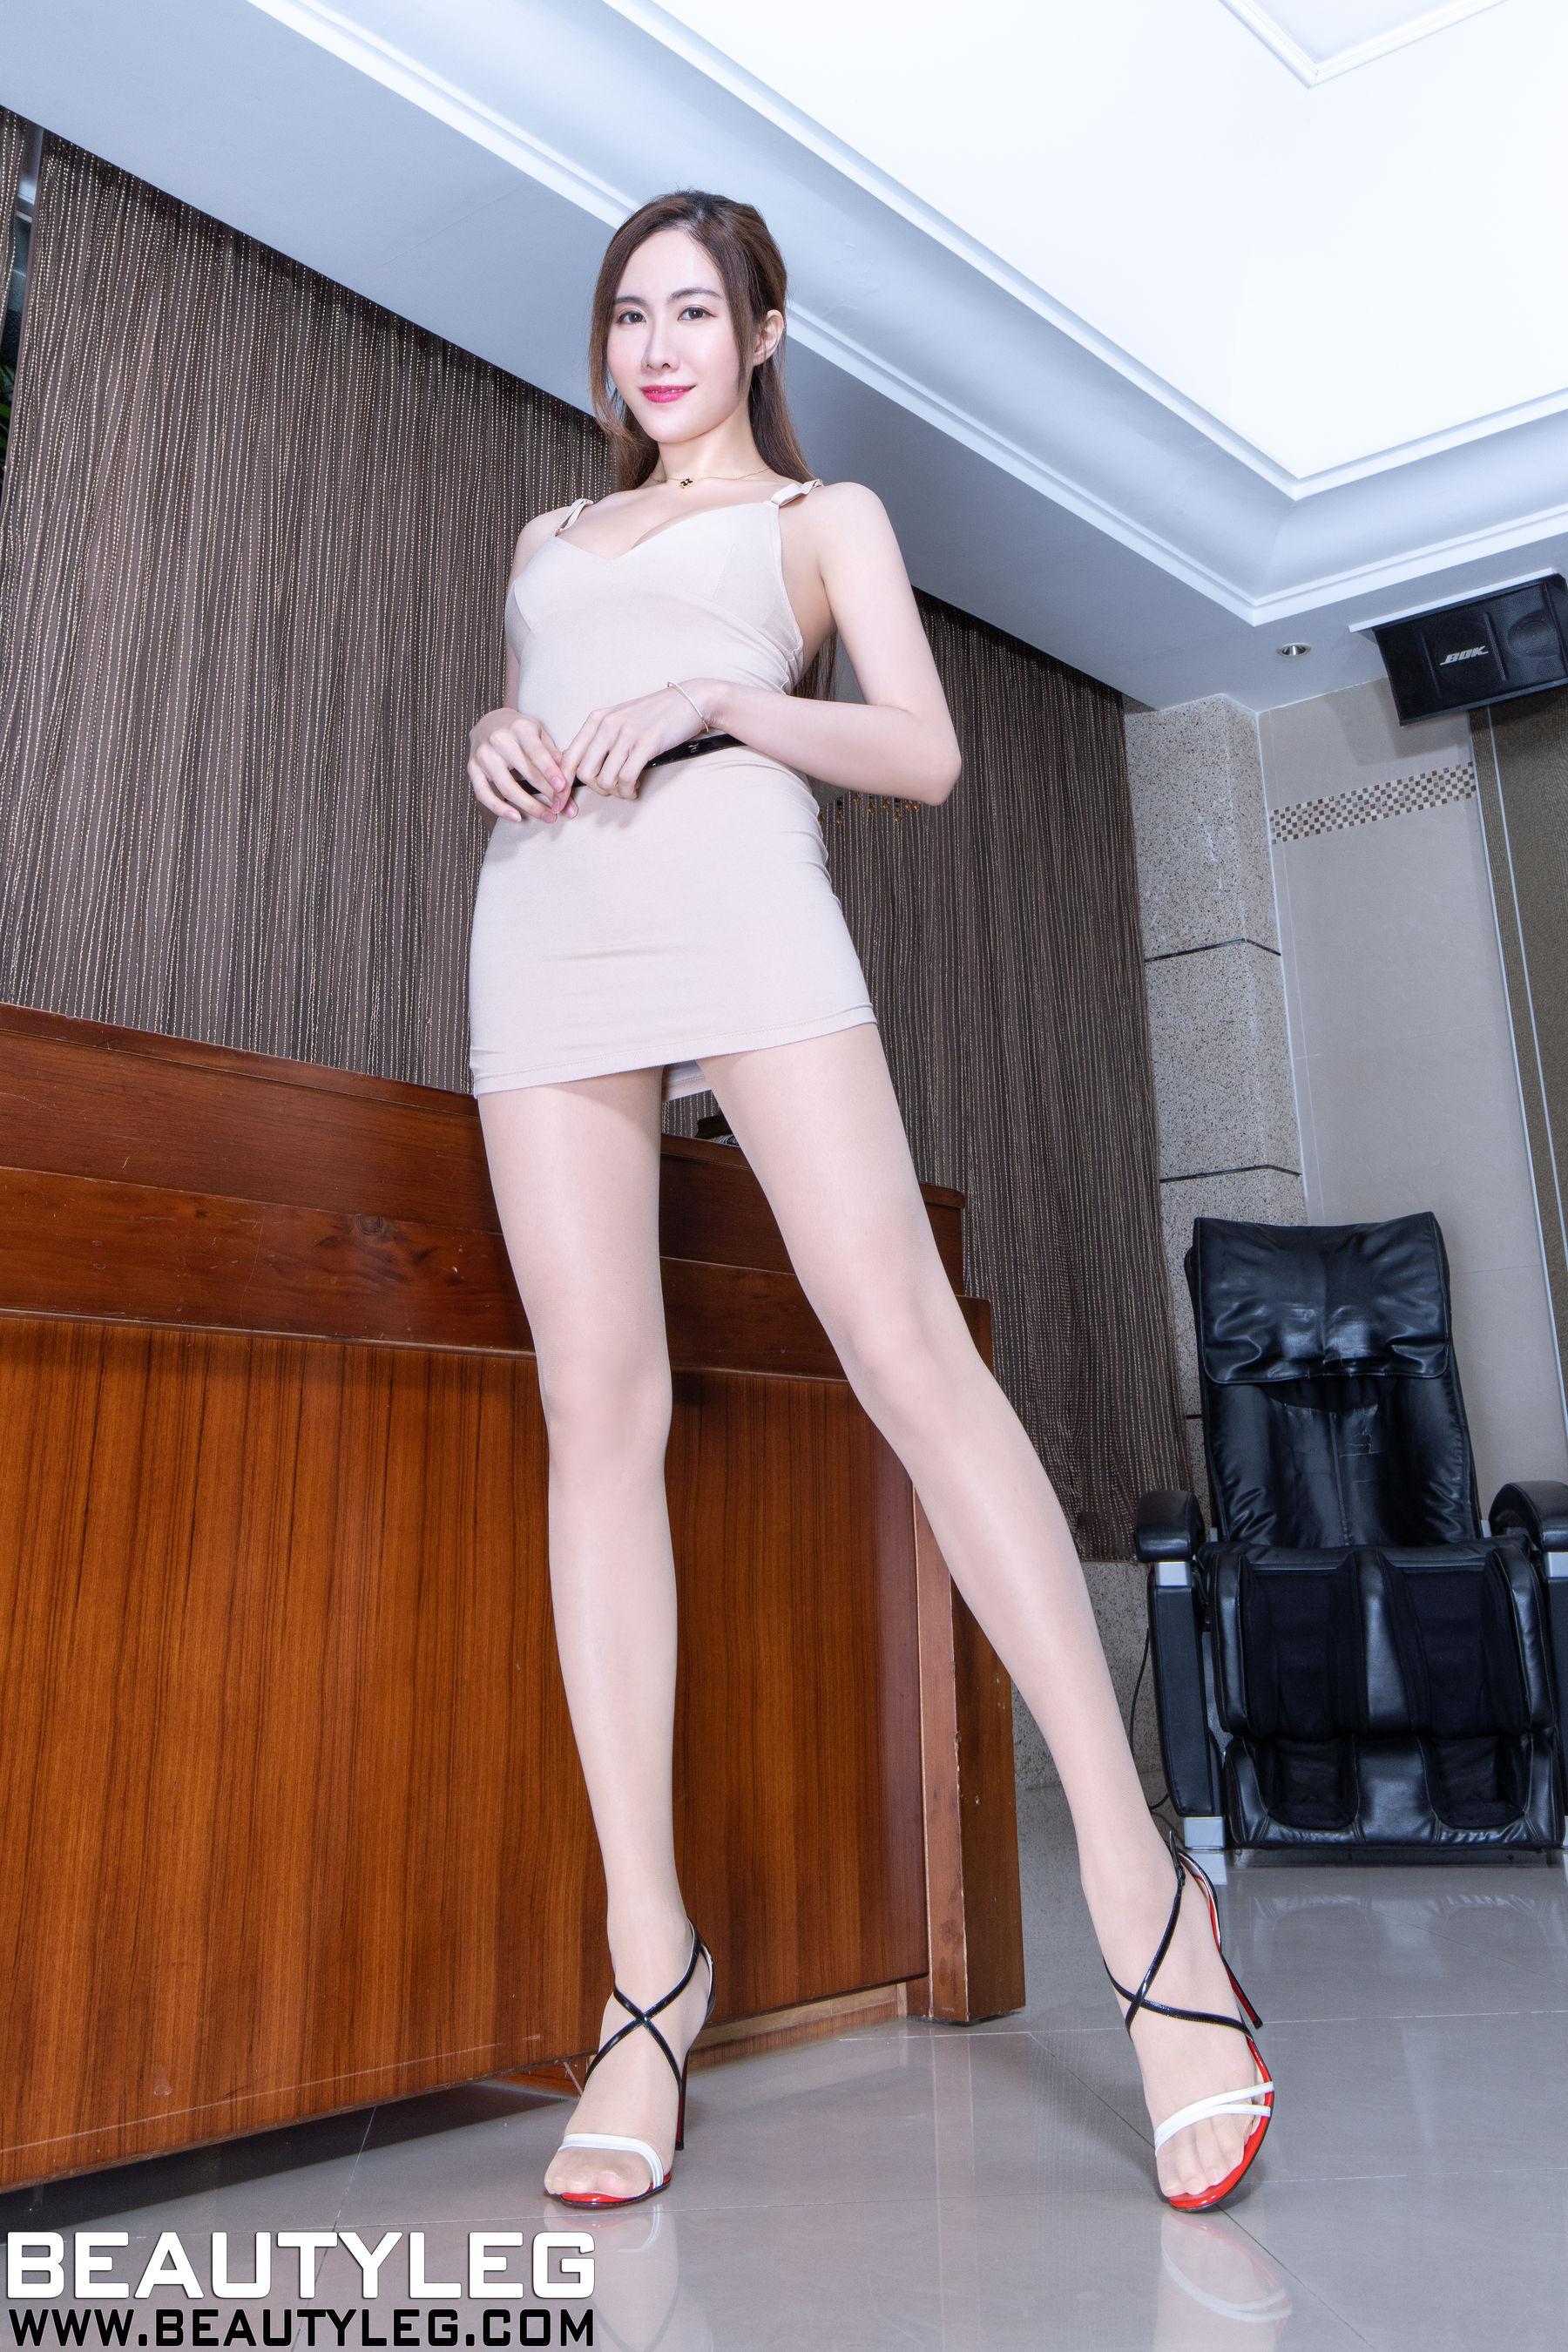 VOL.1734 [Beautyleg]包臀裙美女:曾妍希(腿模Dora)超高清个人性感漂亮大图(45P)